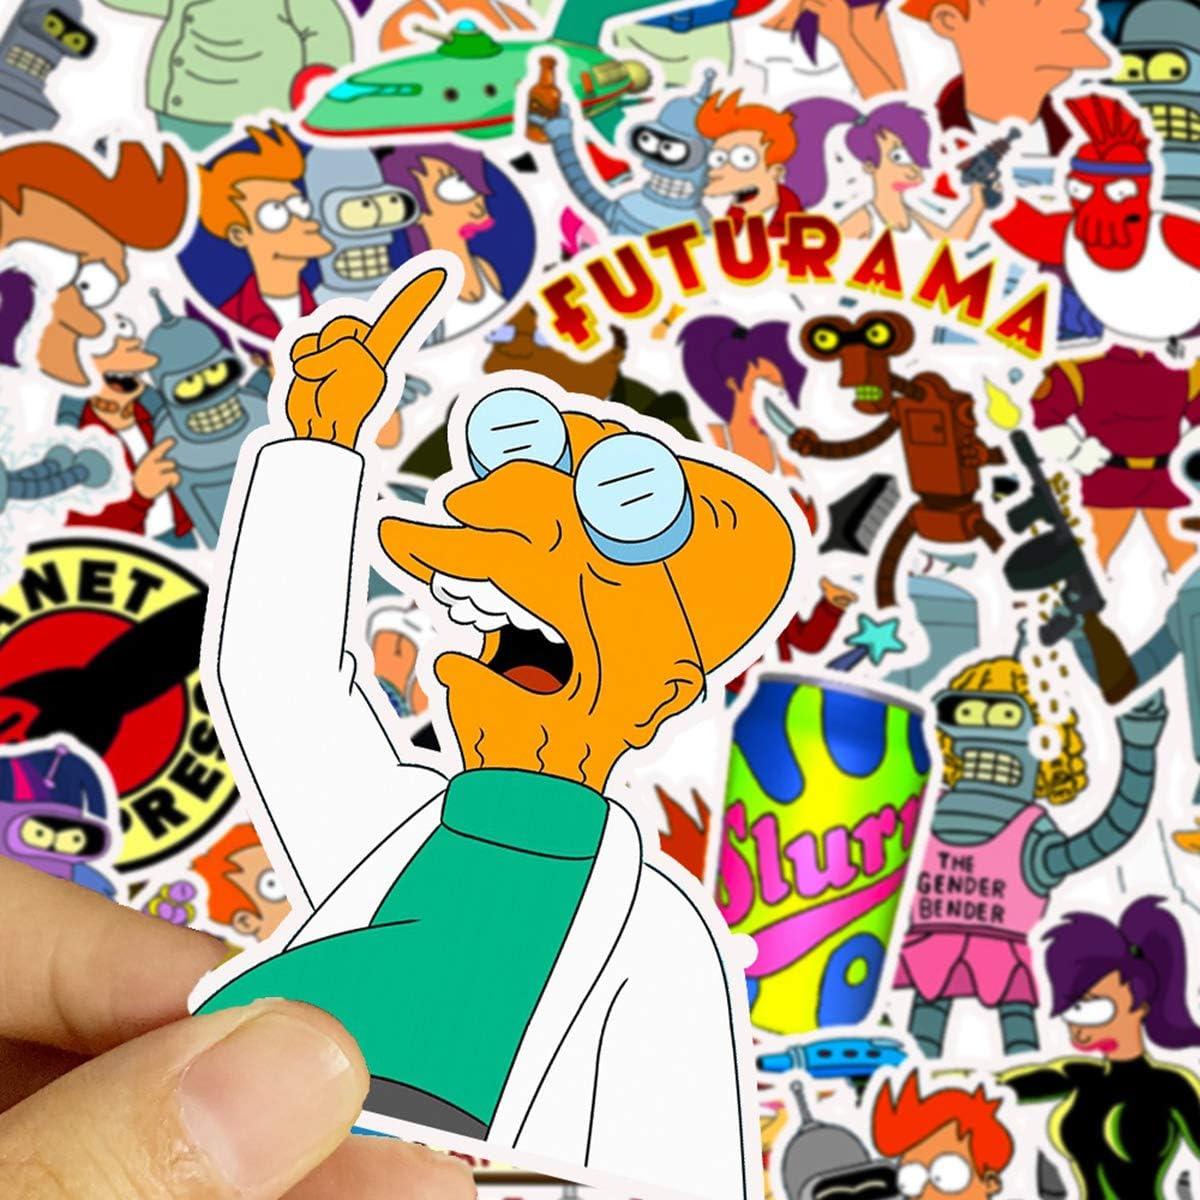 Futurama Themed Futurama TV Series Decal Stickers Cartoon Waterproof Philip J Fry Stickers Car Laptop Helmet Luggage Vintage Skateboard Wall Decor Gift for Kids